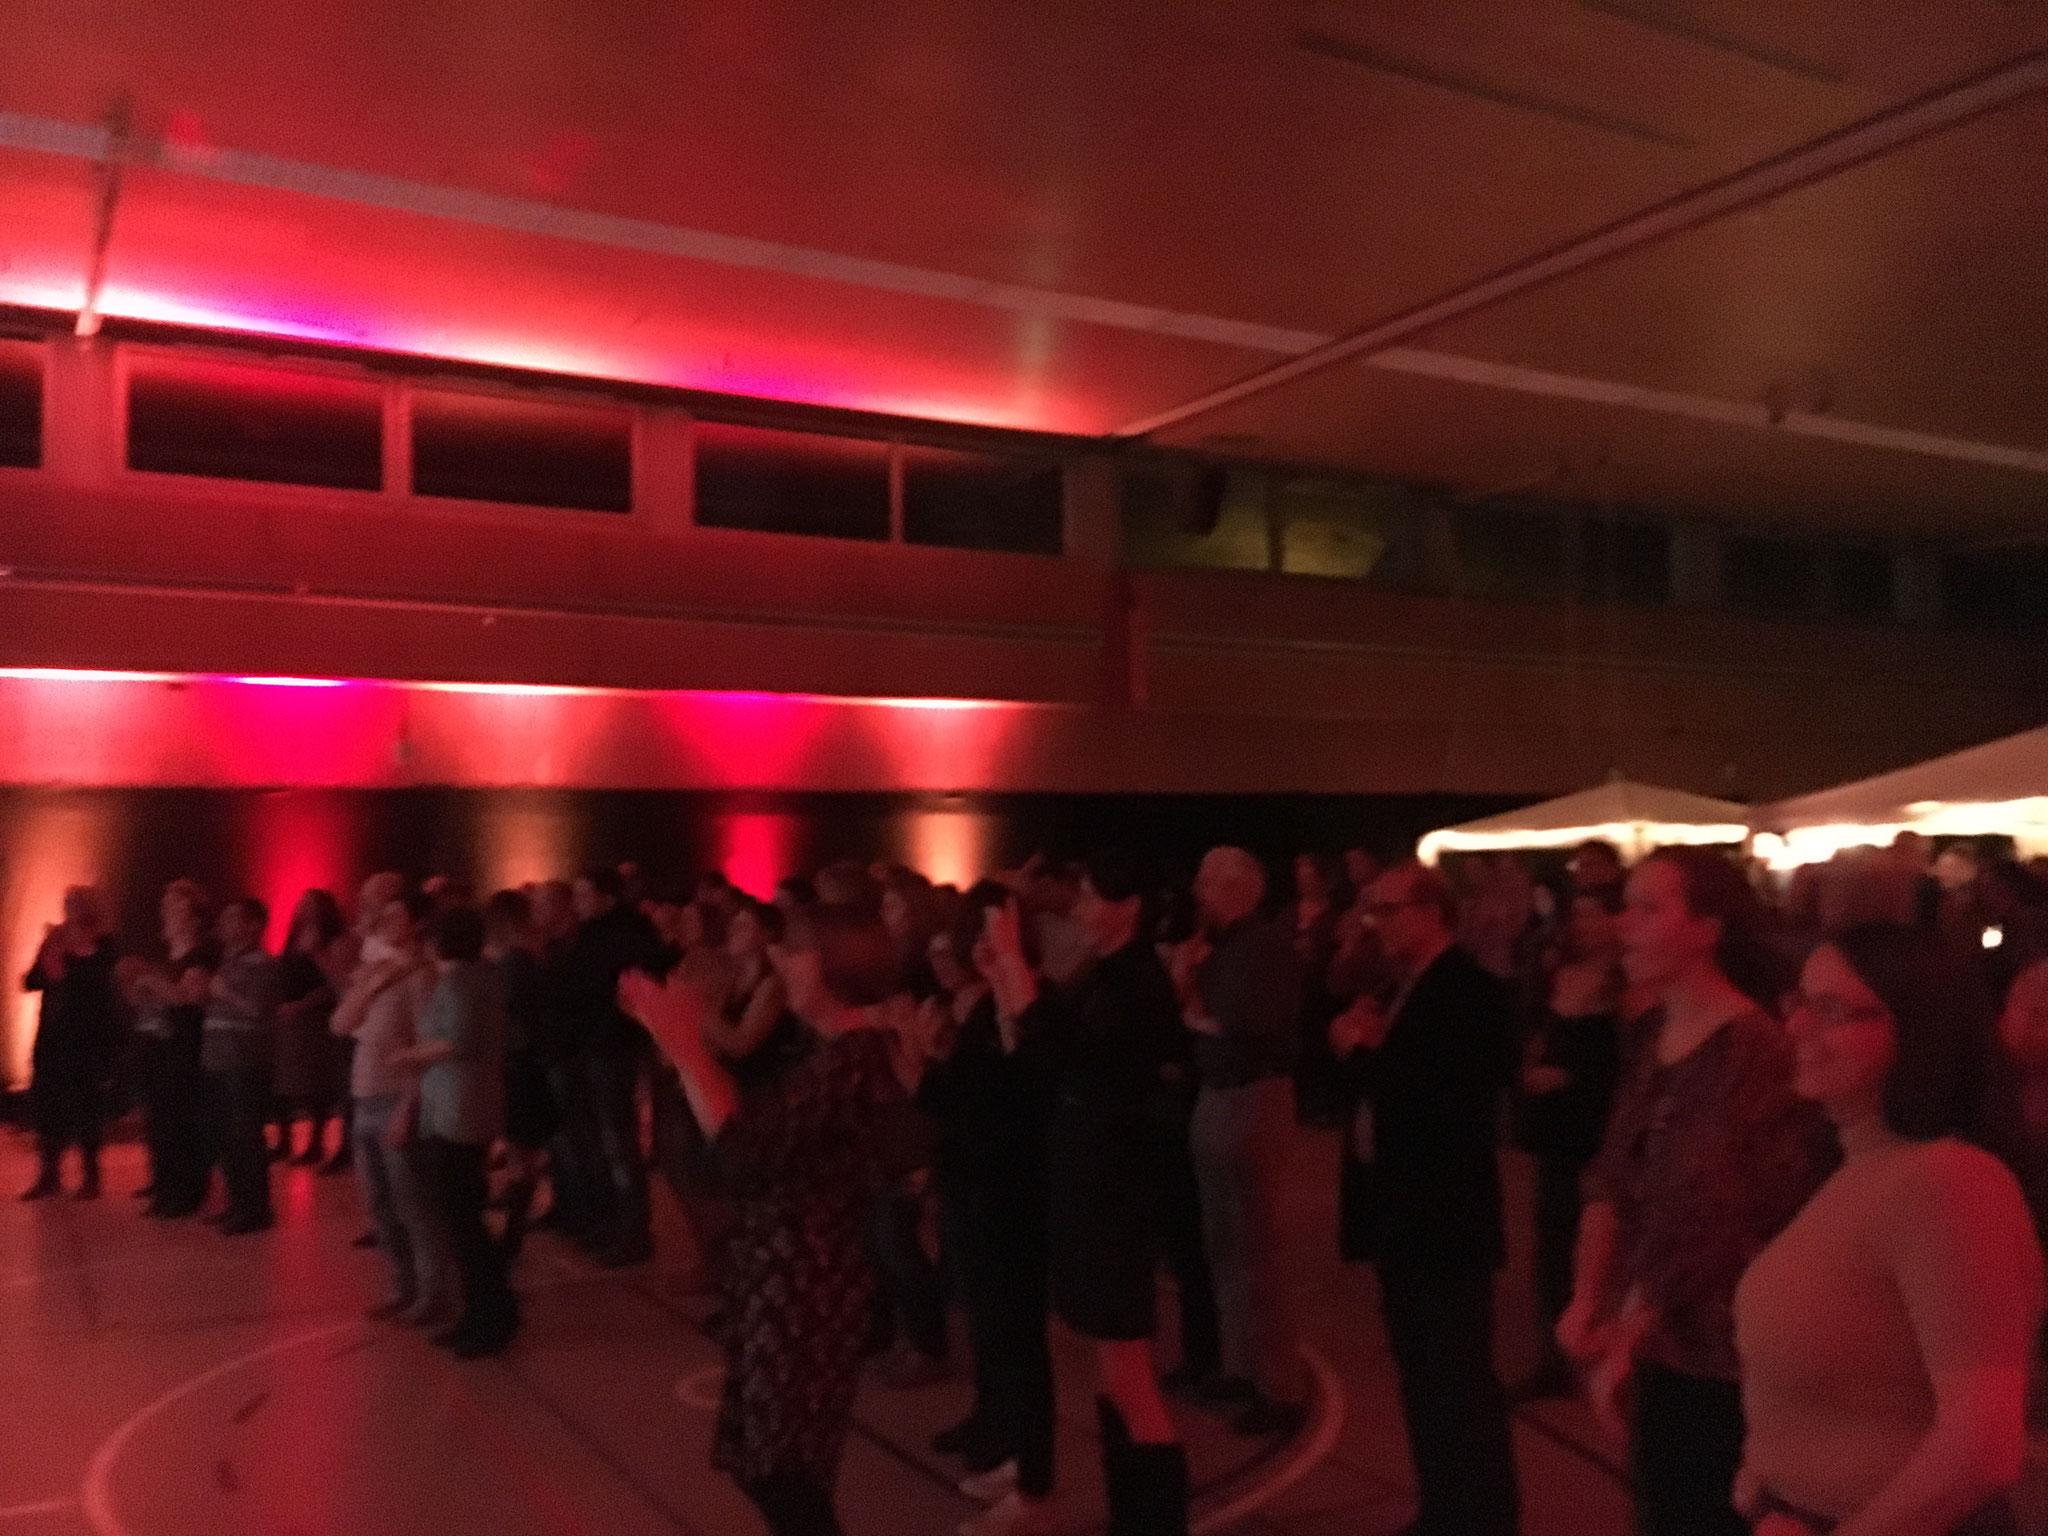 Danceparty mit Szenenwechsel e.V. 206